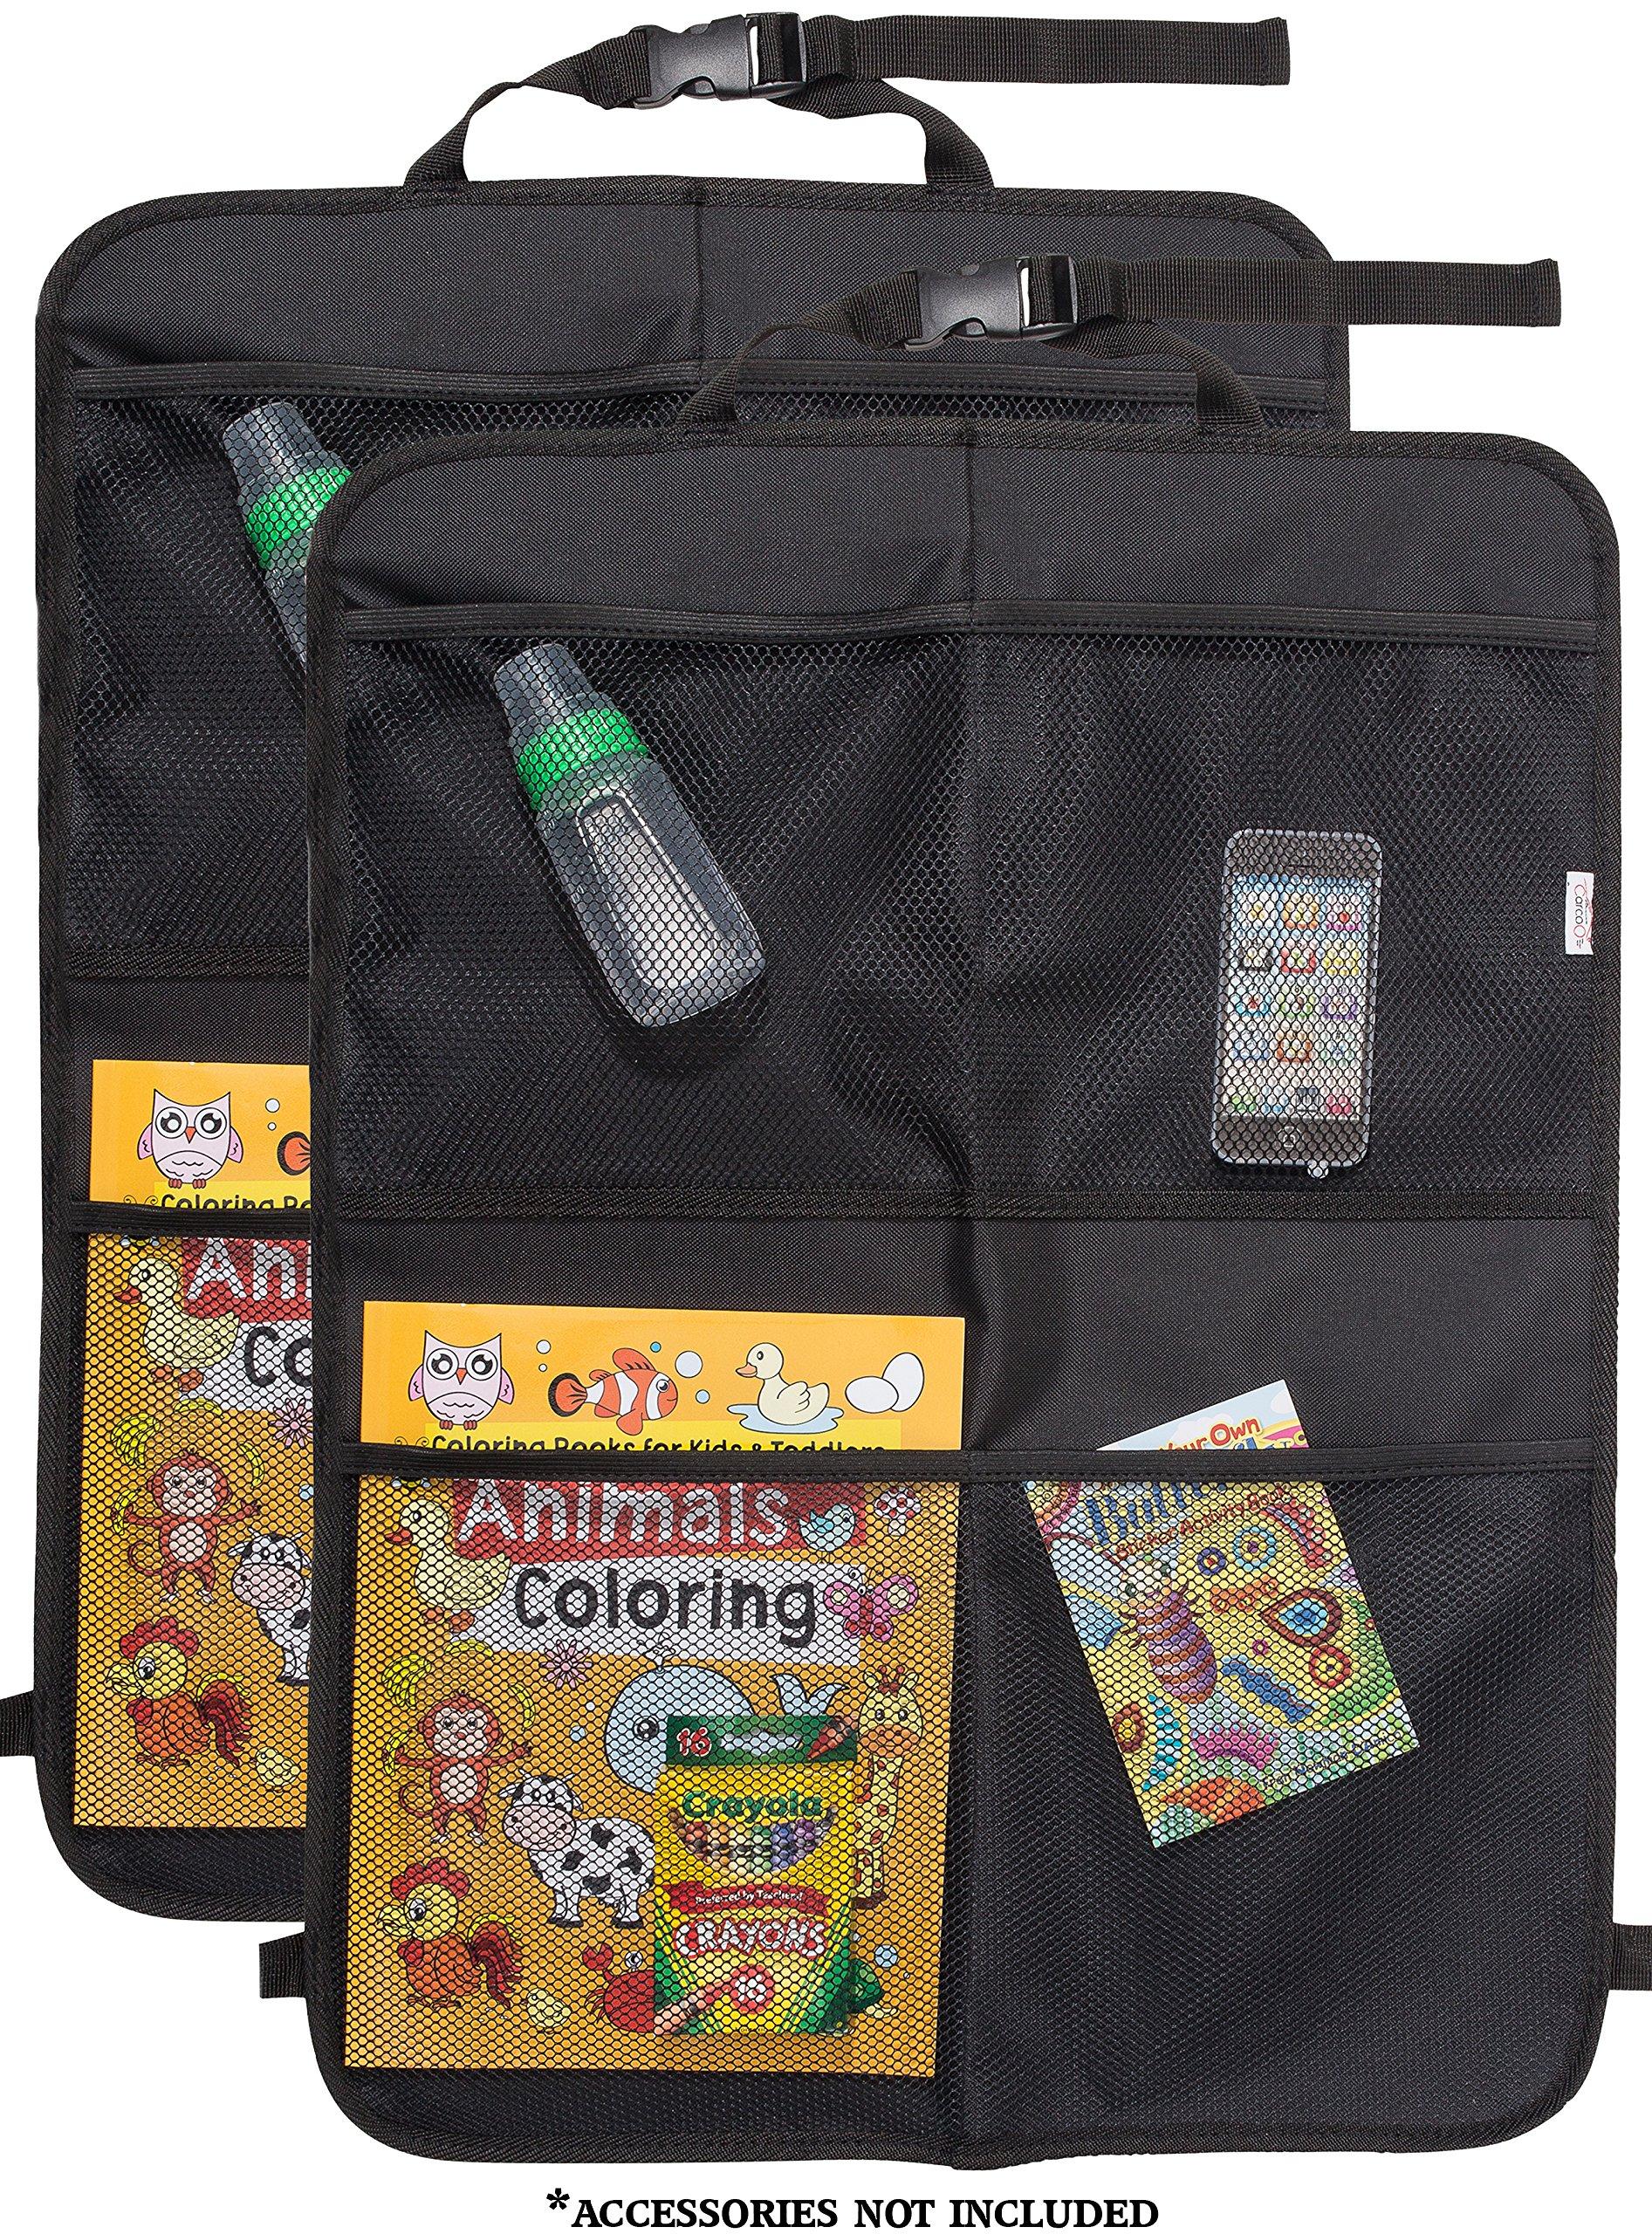 CarCoo Kick mat Back seat Protector for Kids, Large car seat Back Cover, Universal fit, Waterproof Organizer Kick mats, 2 Pack.